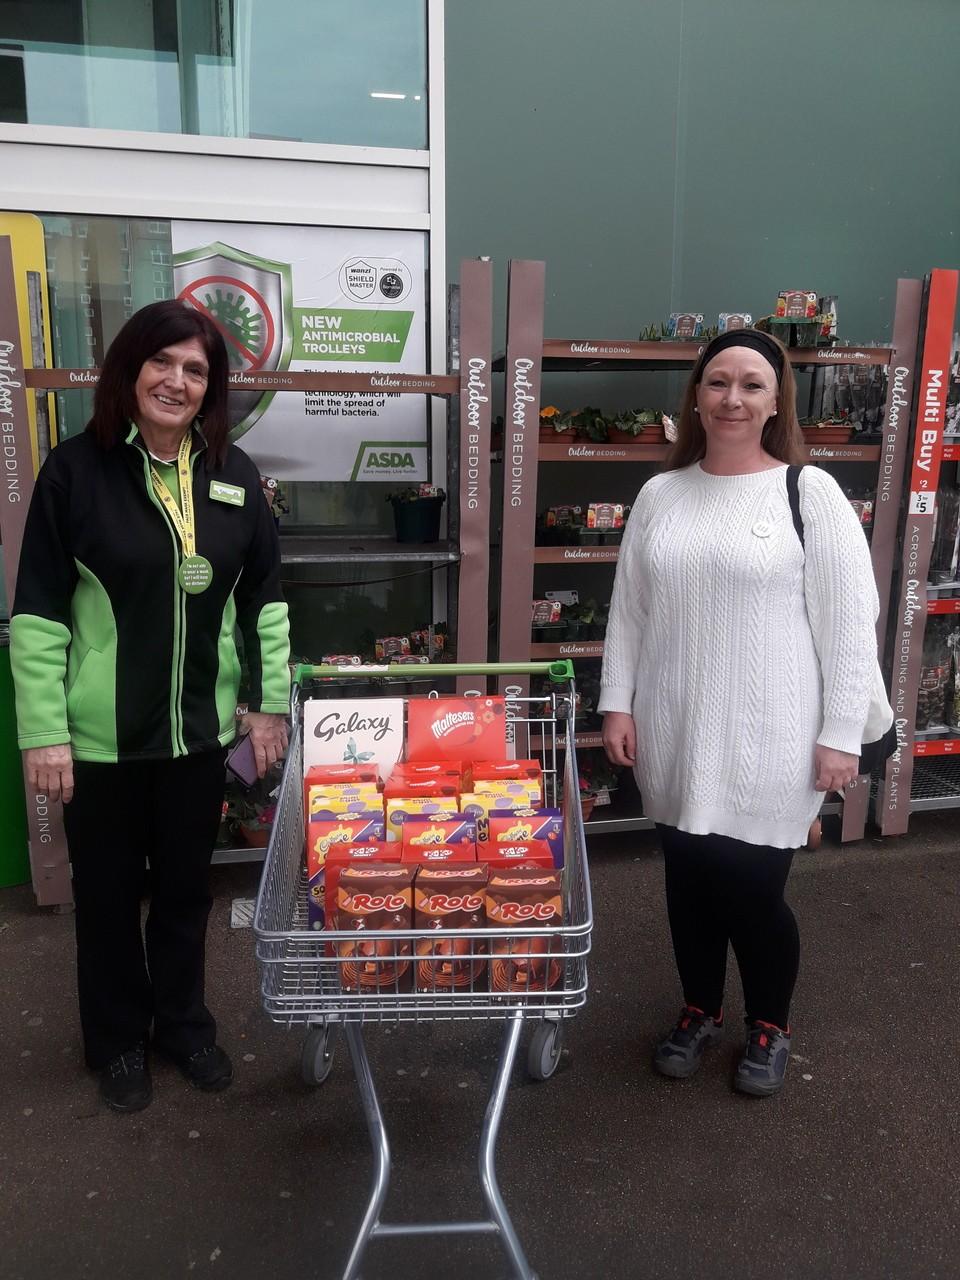 Easter egg donation | Asda Poole